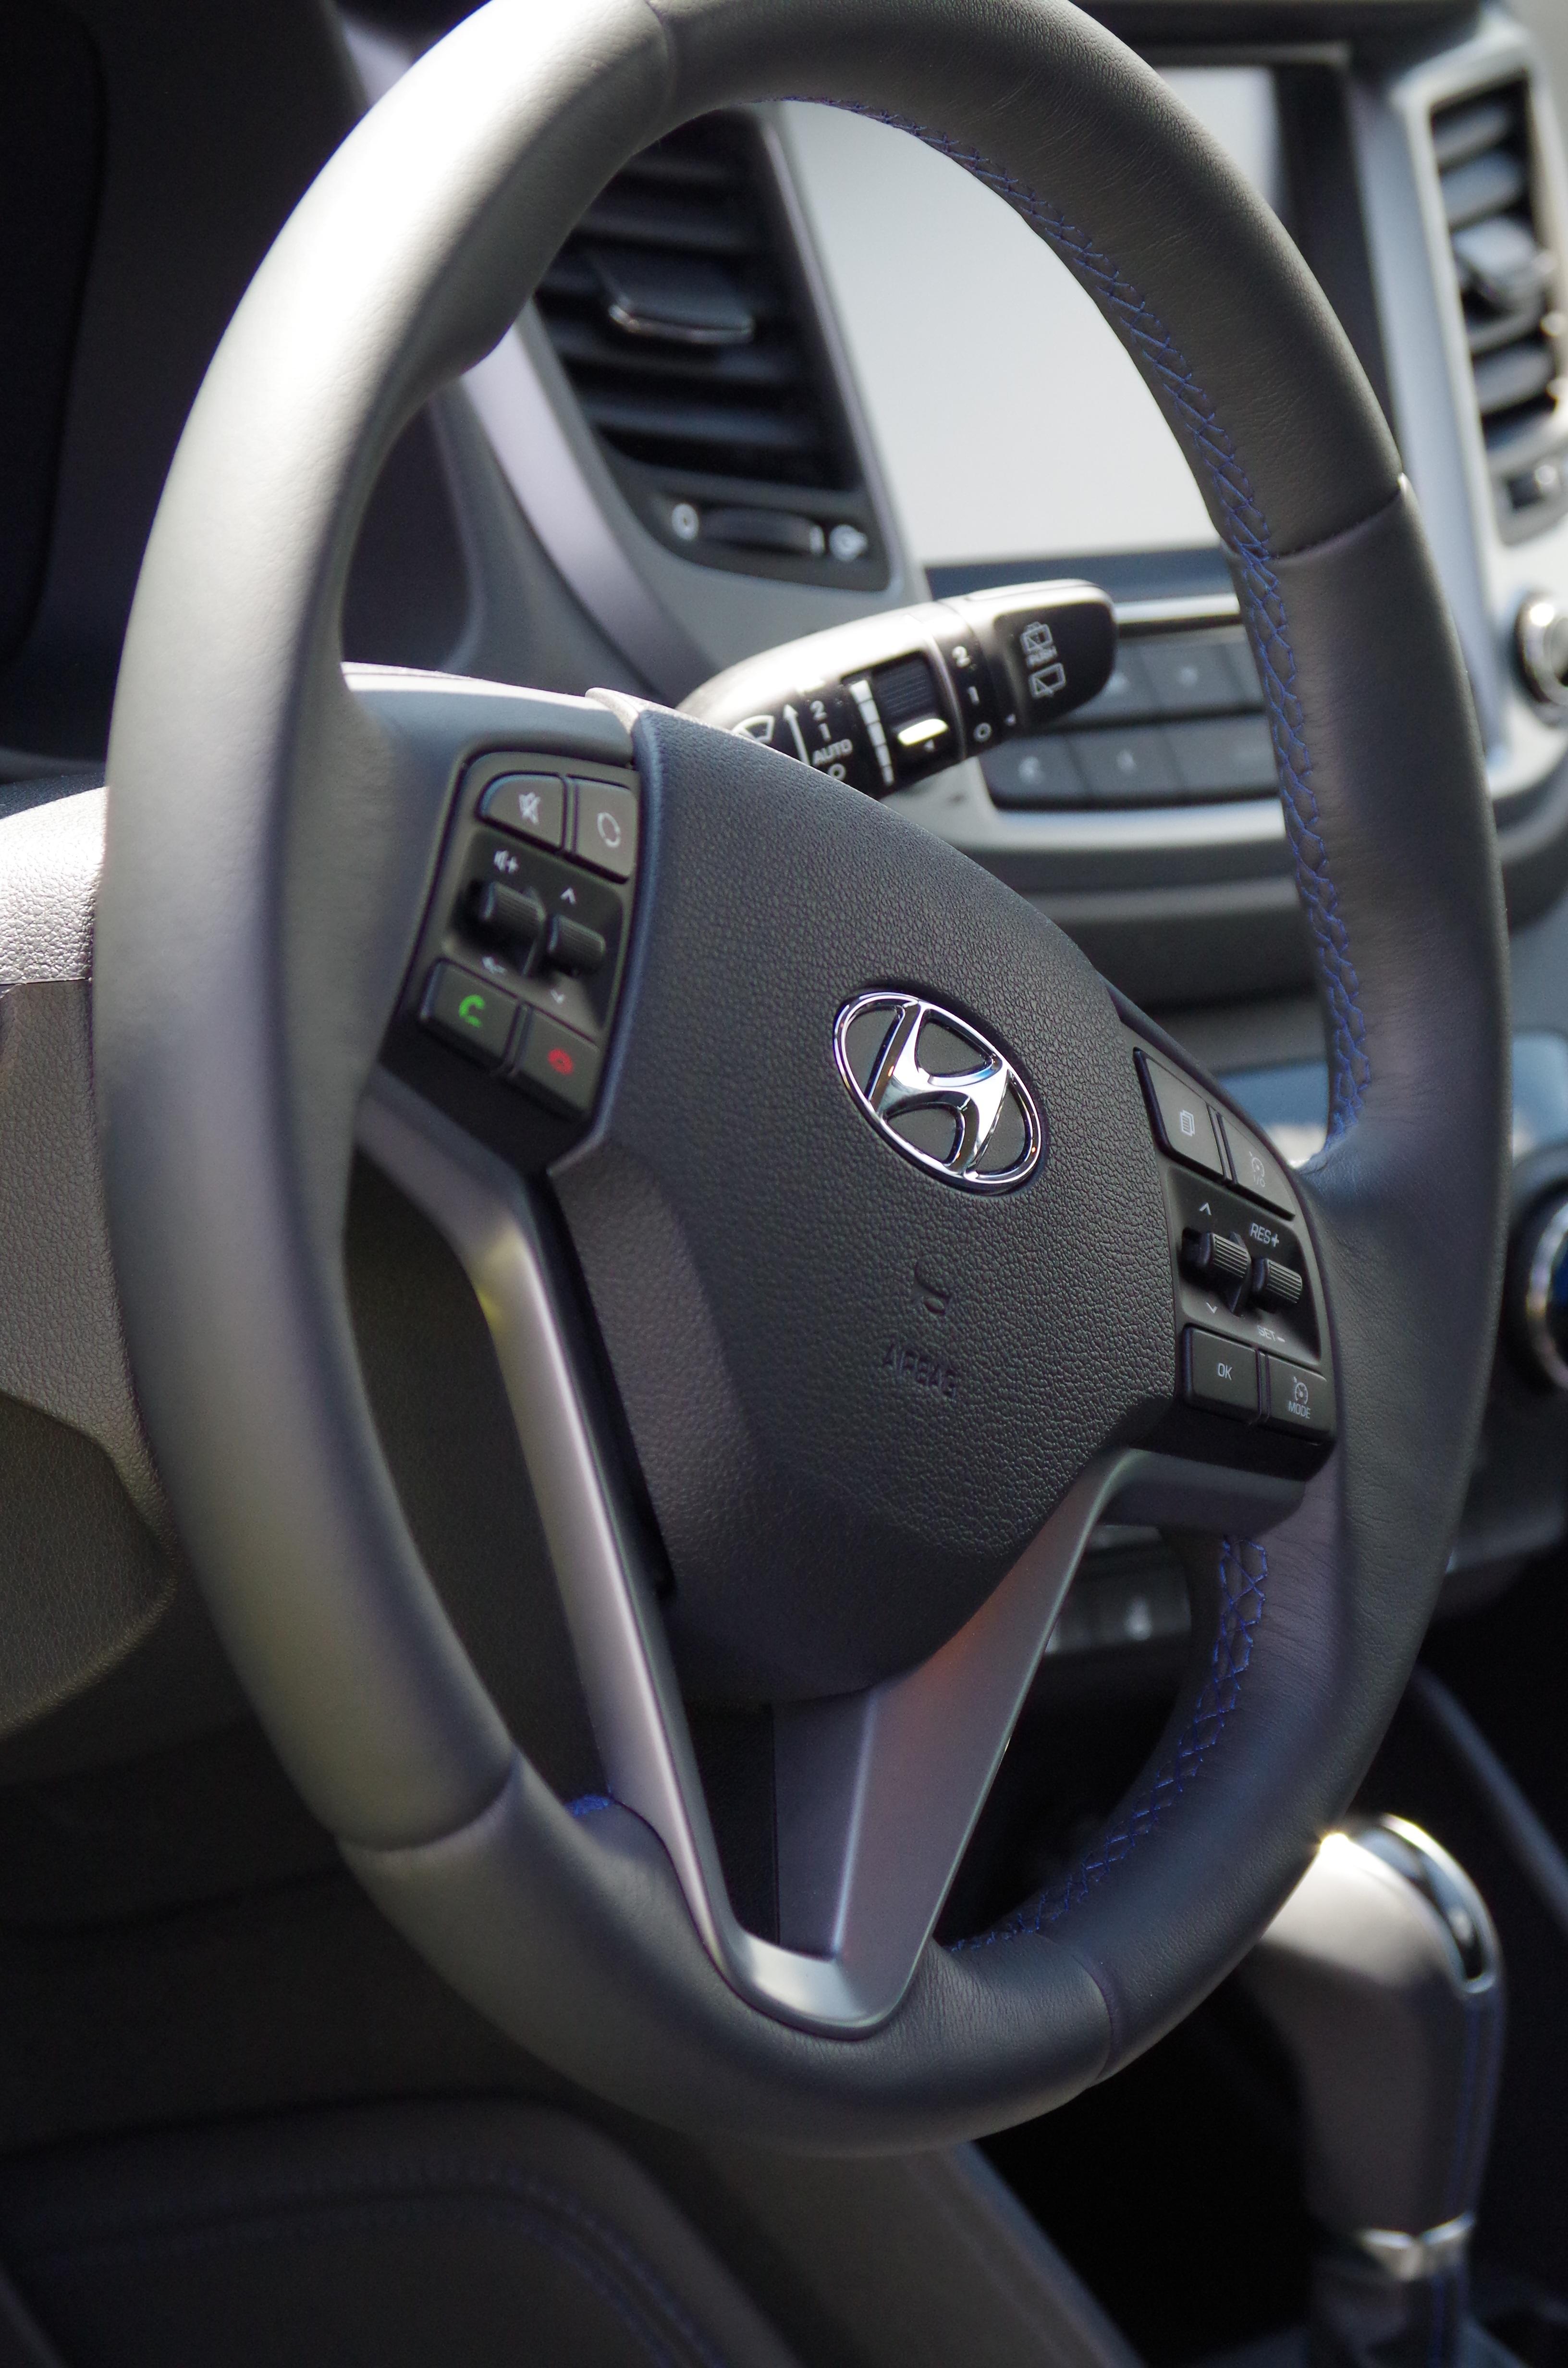 Kostenlose foto : Rad, Innere, Fahrzeug, Lenkrad, Reifen ...